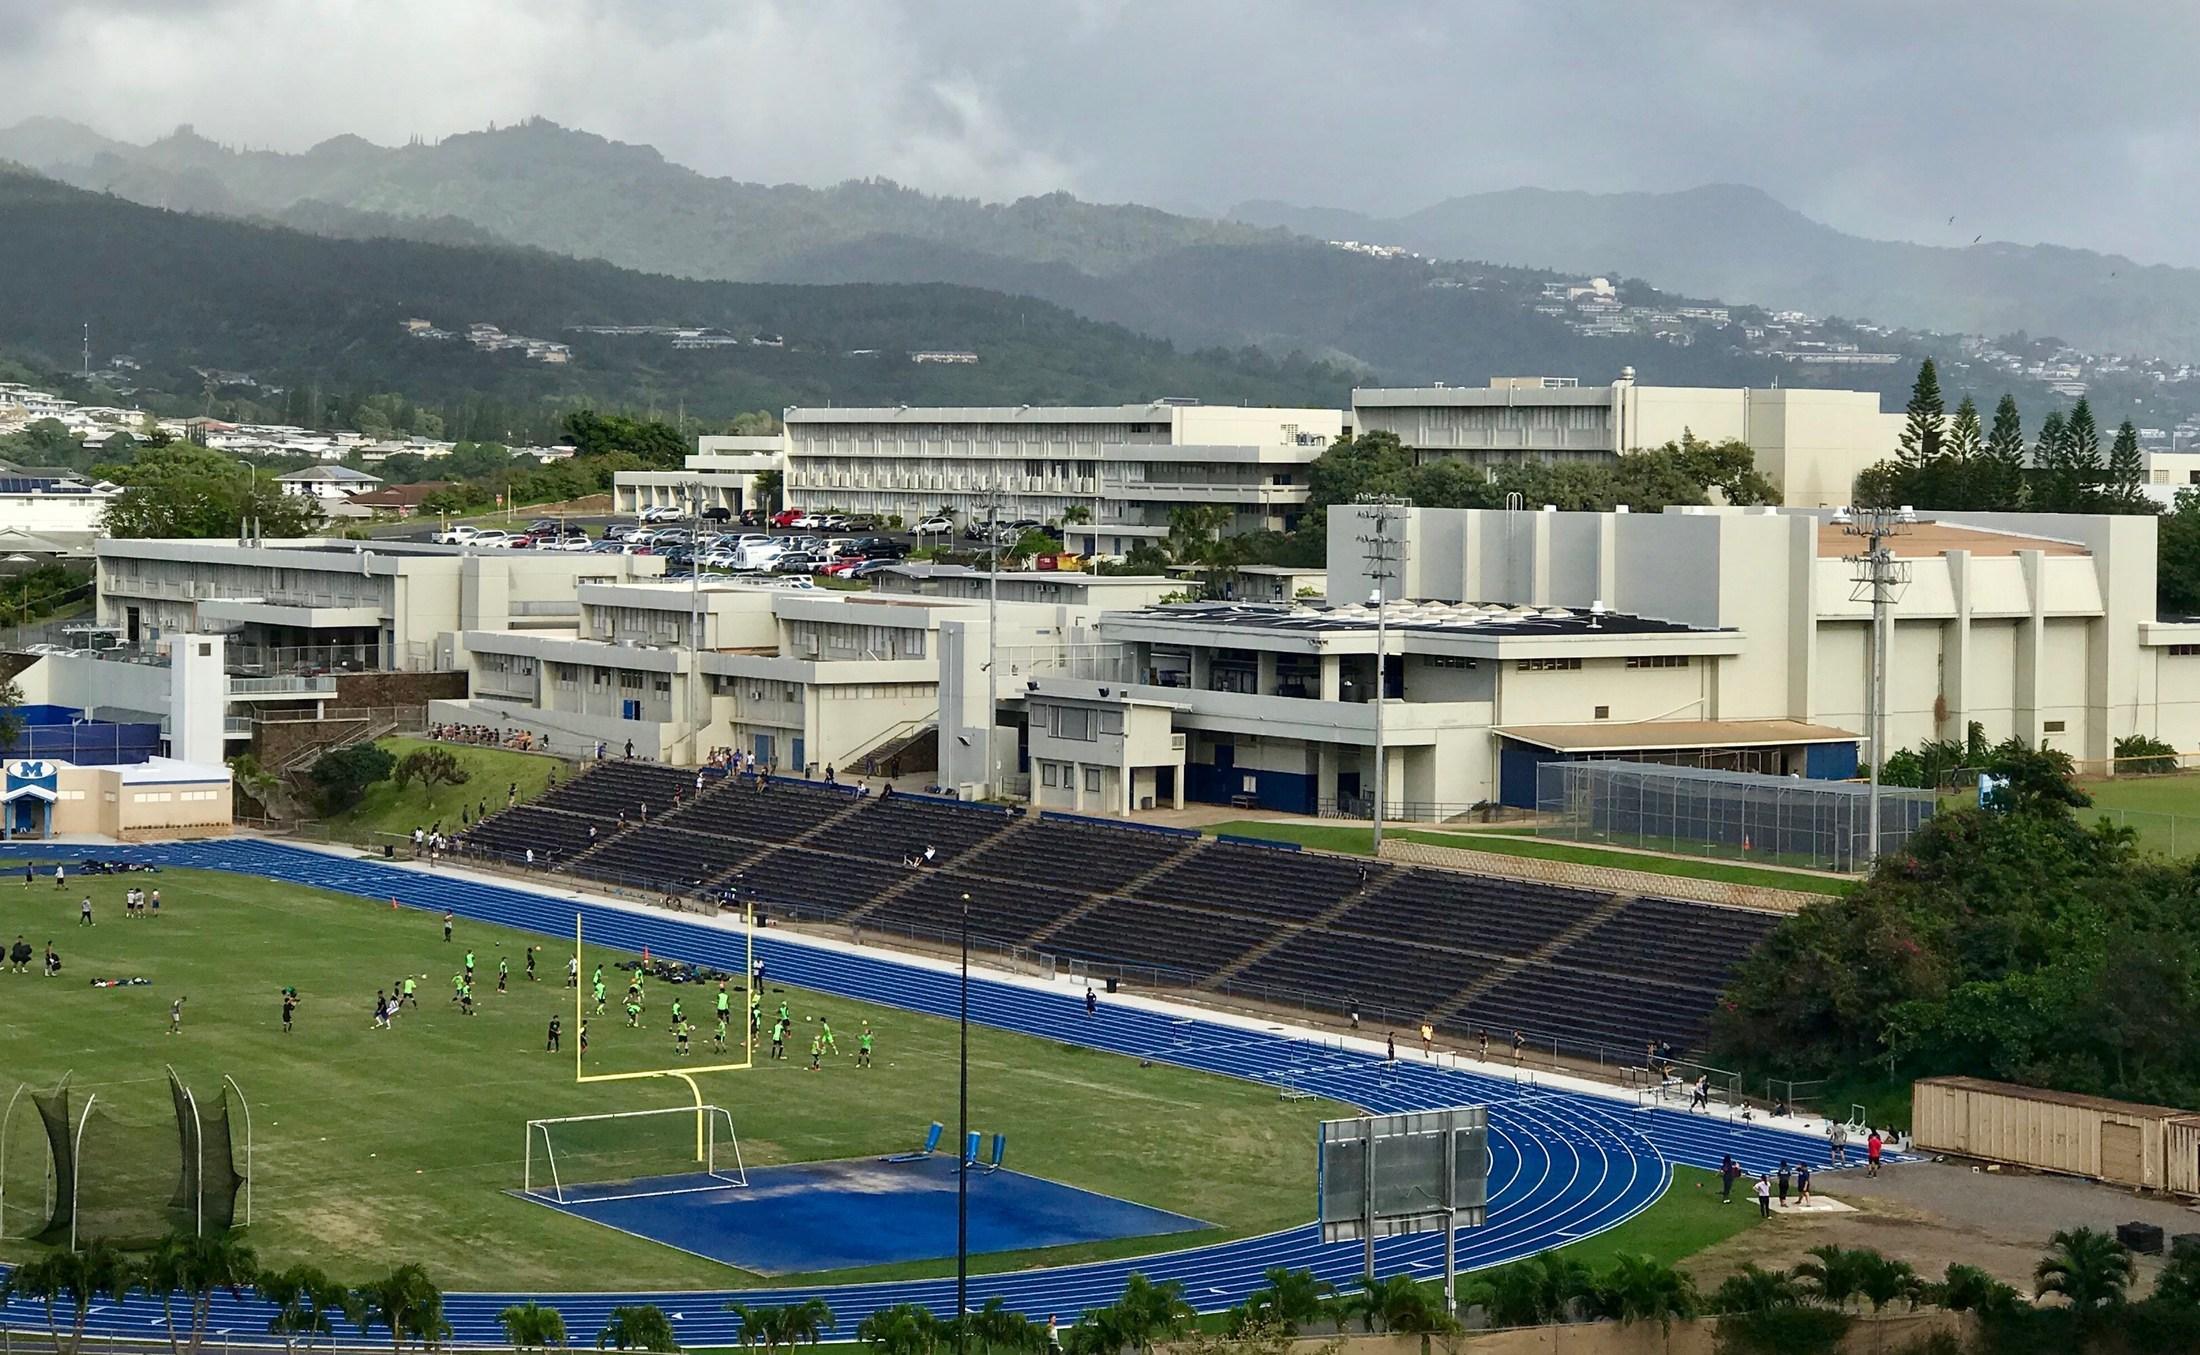 Moanalua Athletics - Moanalua High School